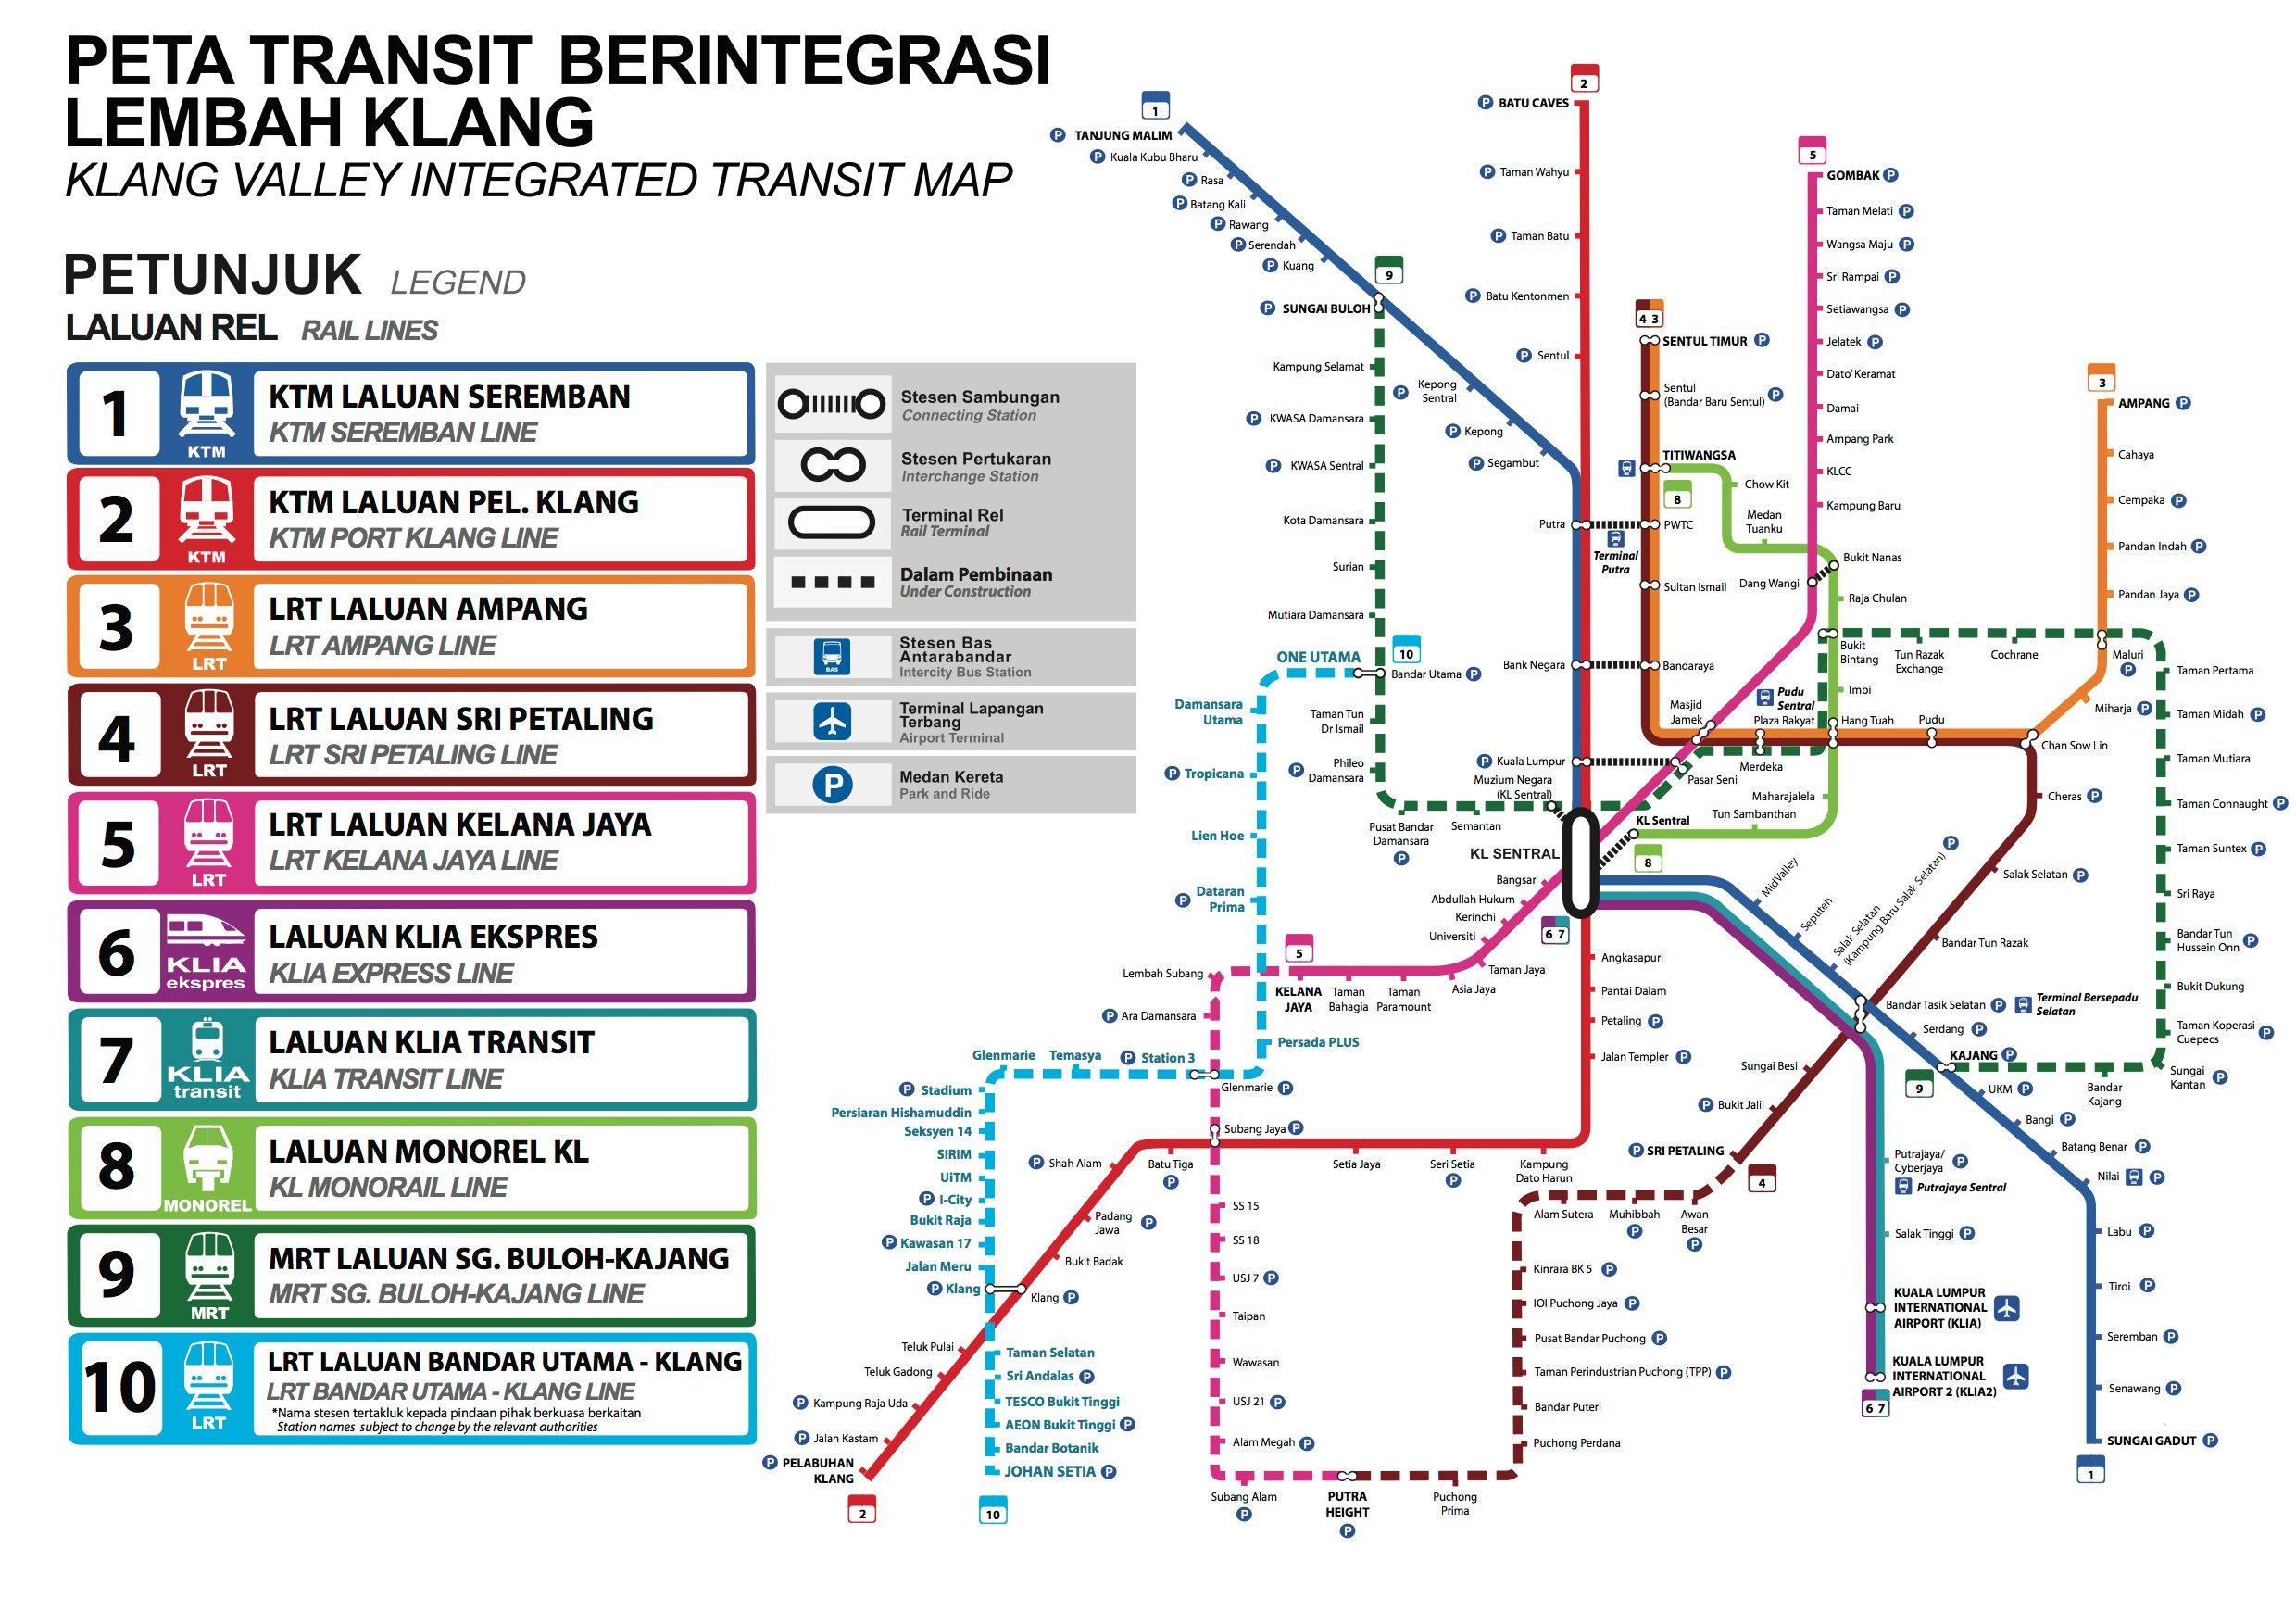 LRT3 Bandar Utama-Klang rail project - more details about